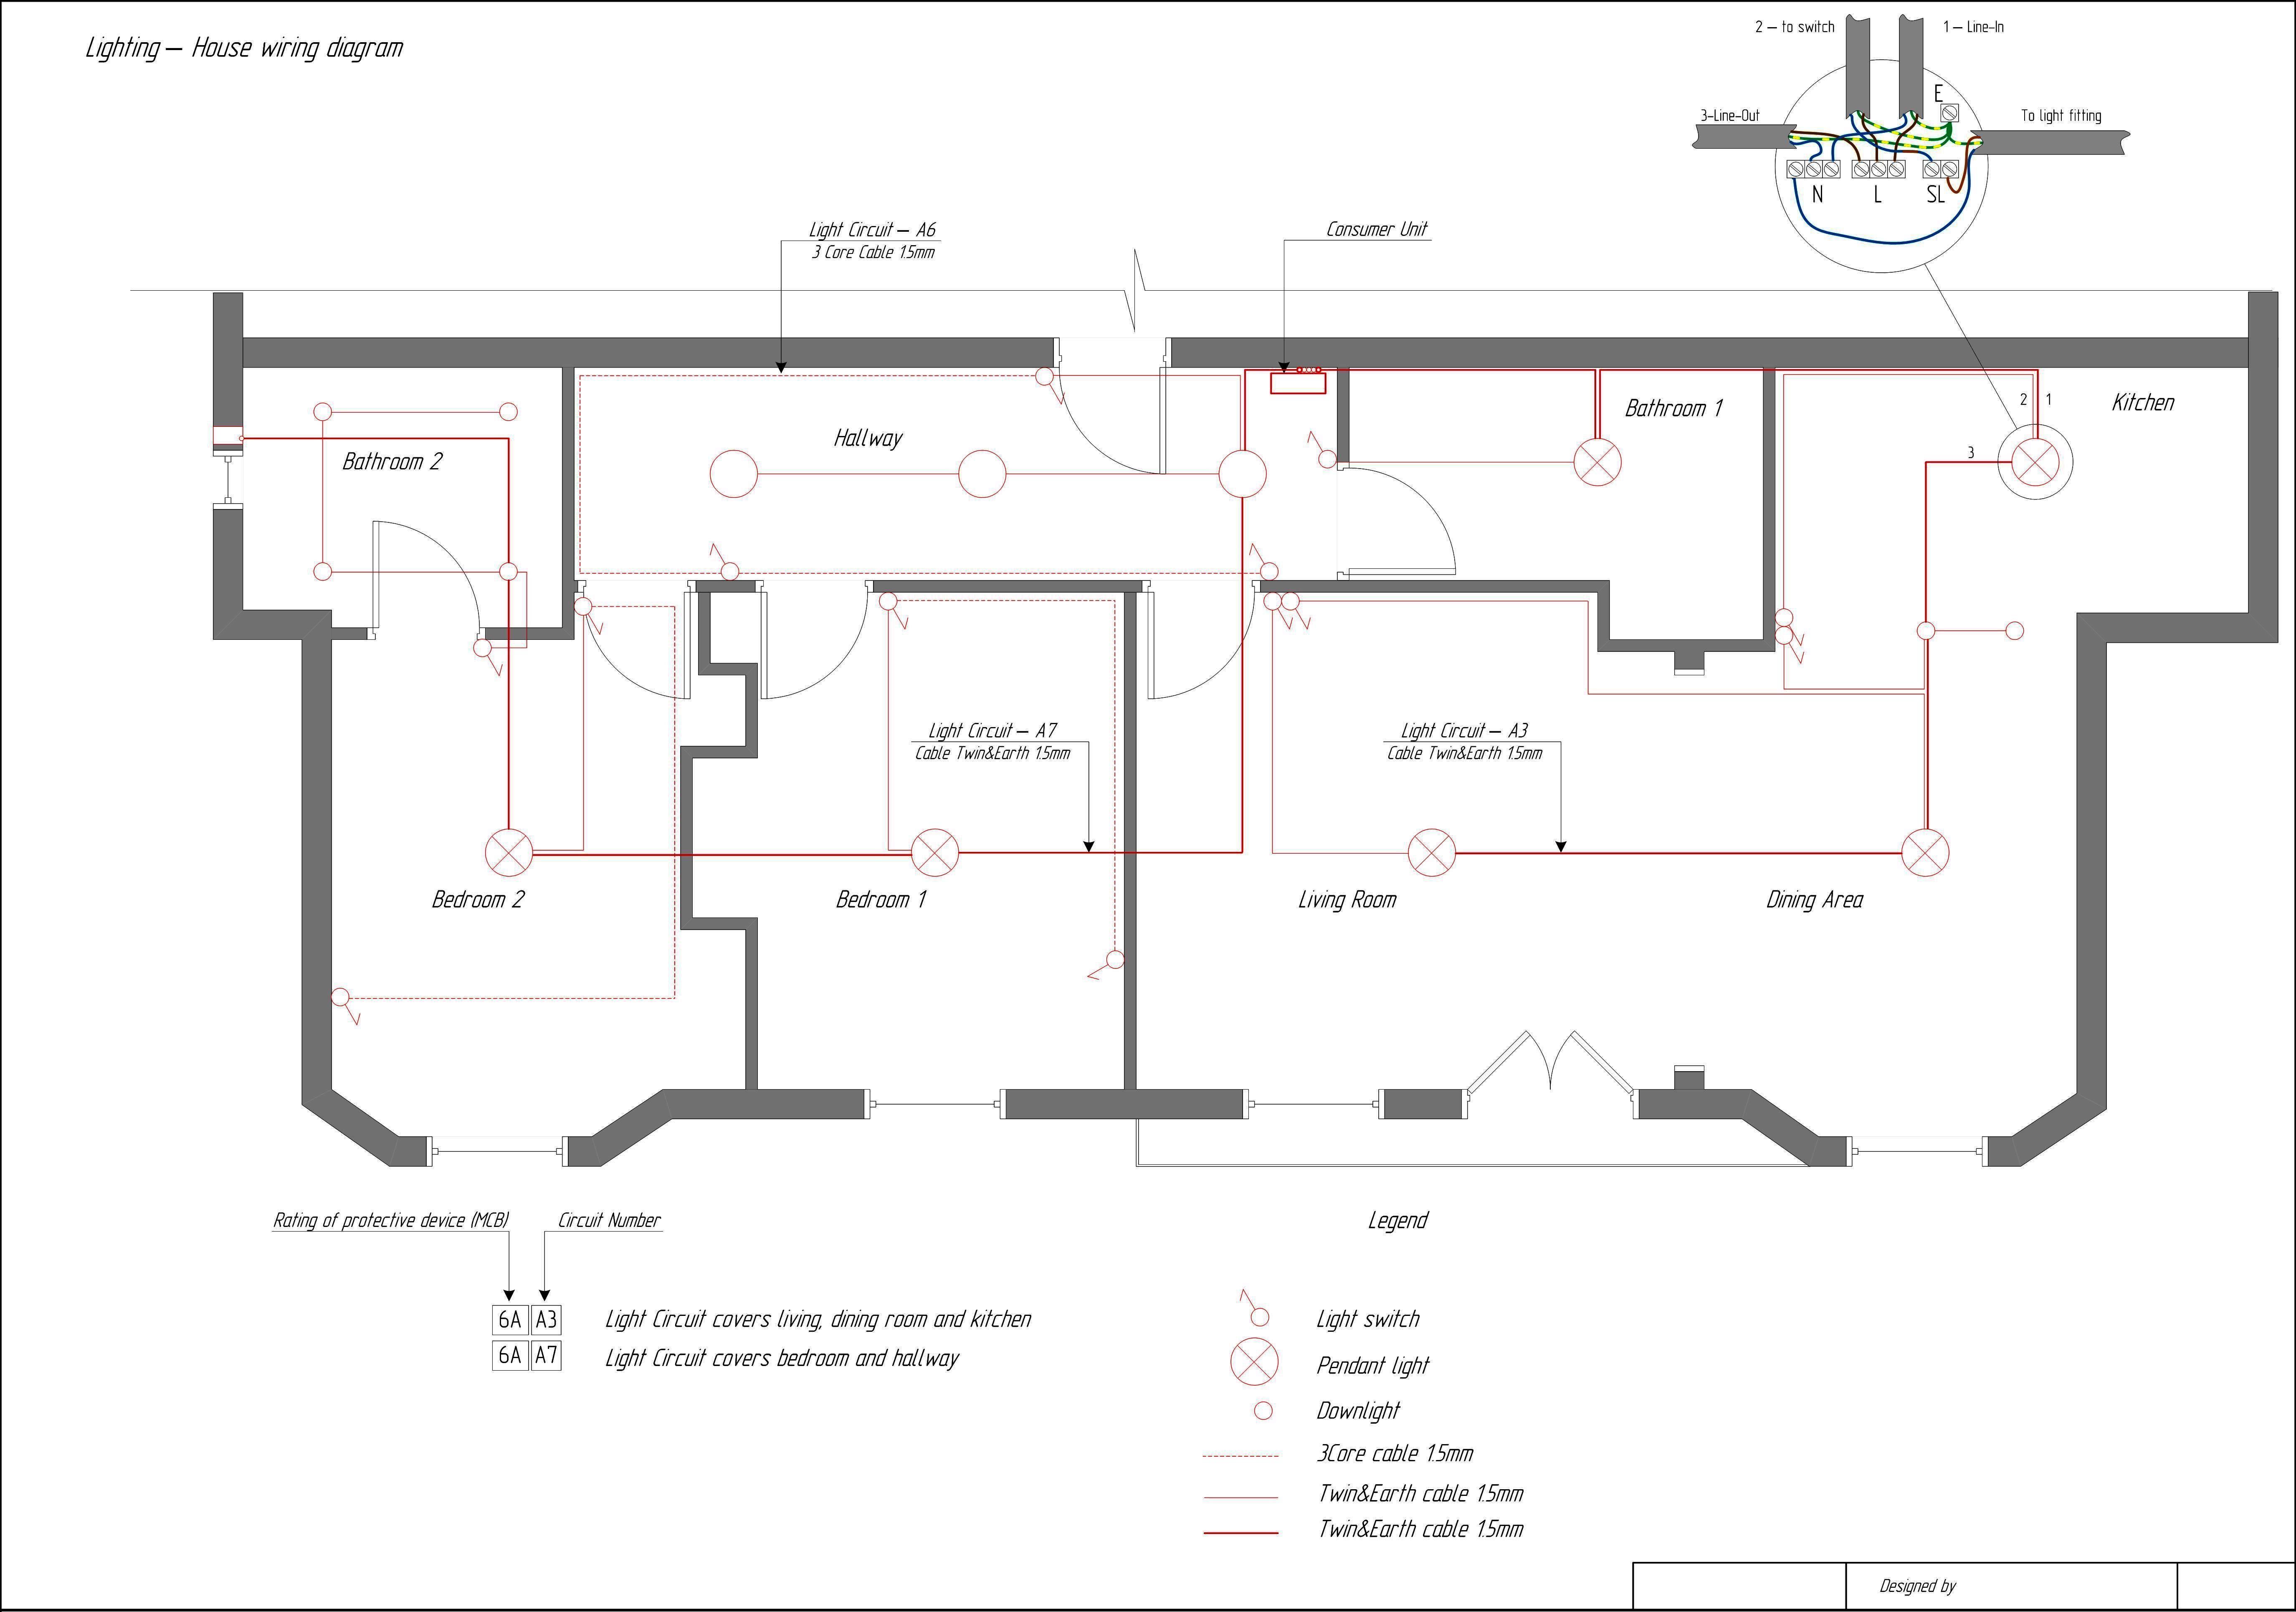 Household Wiring Diagrams - Data Wiring Diagram Today - Basic House Wiring Diagram